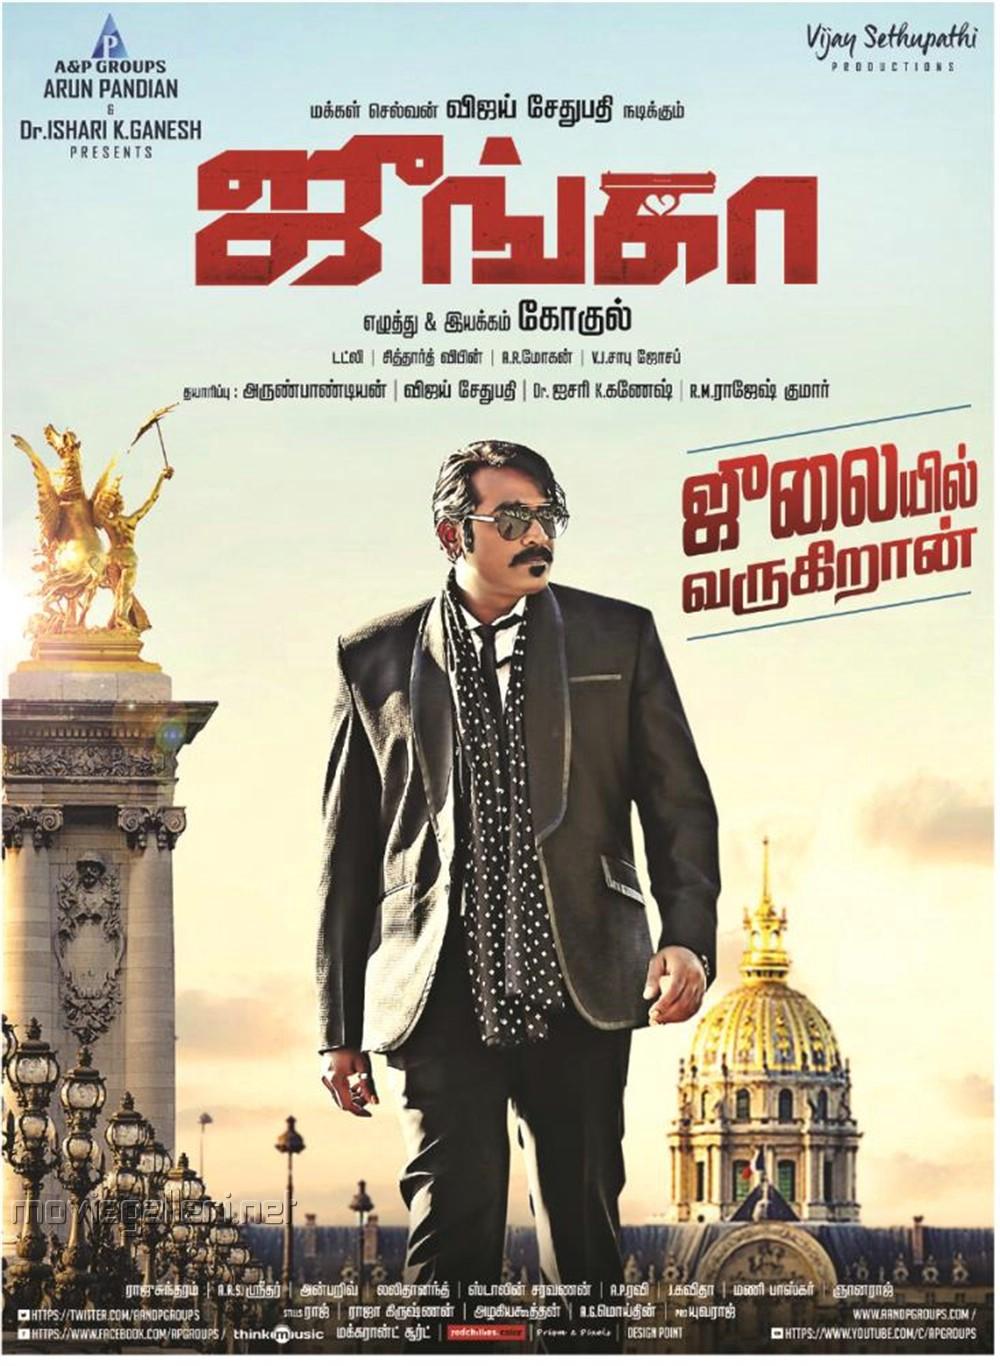 Vijay Sethupathi Junga Movie Release Posters